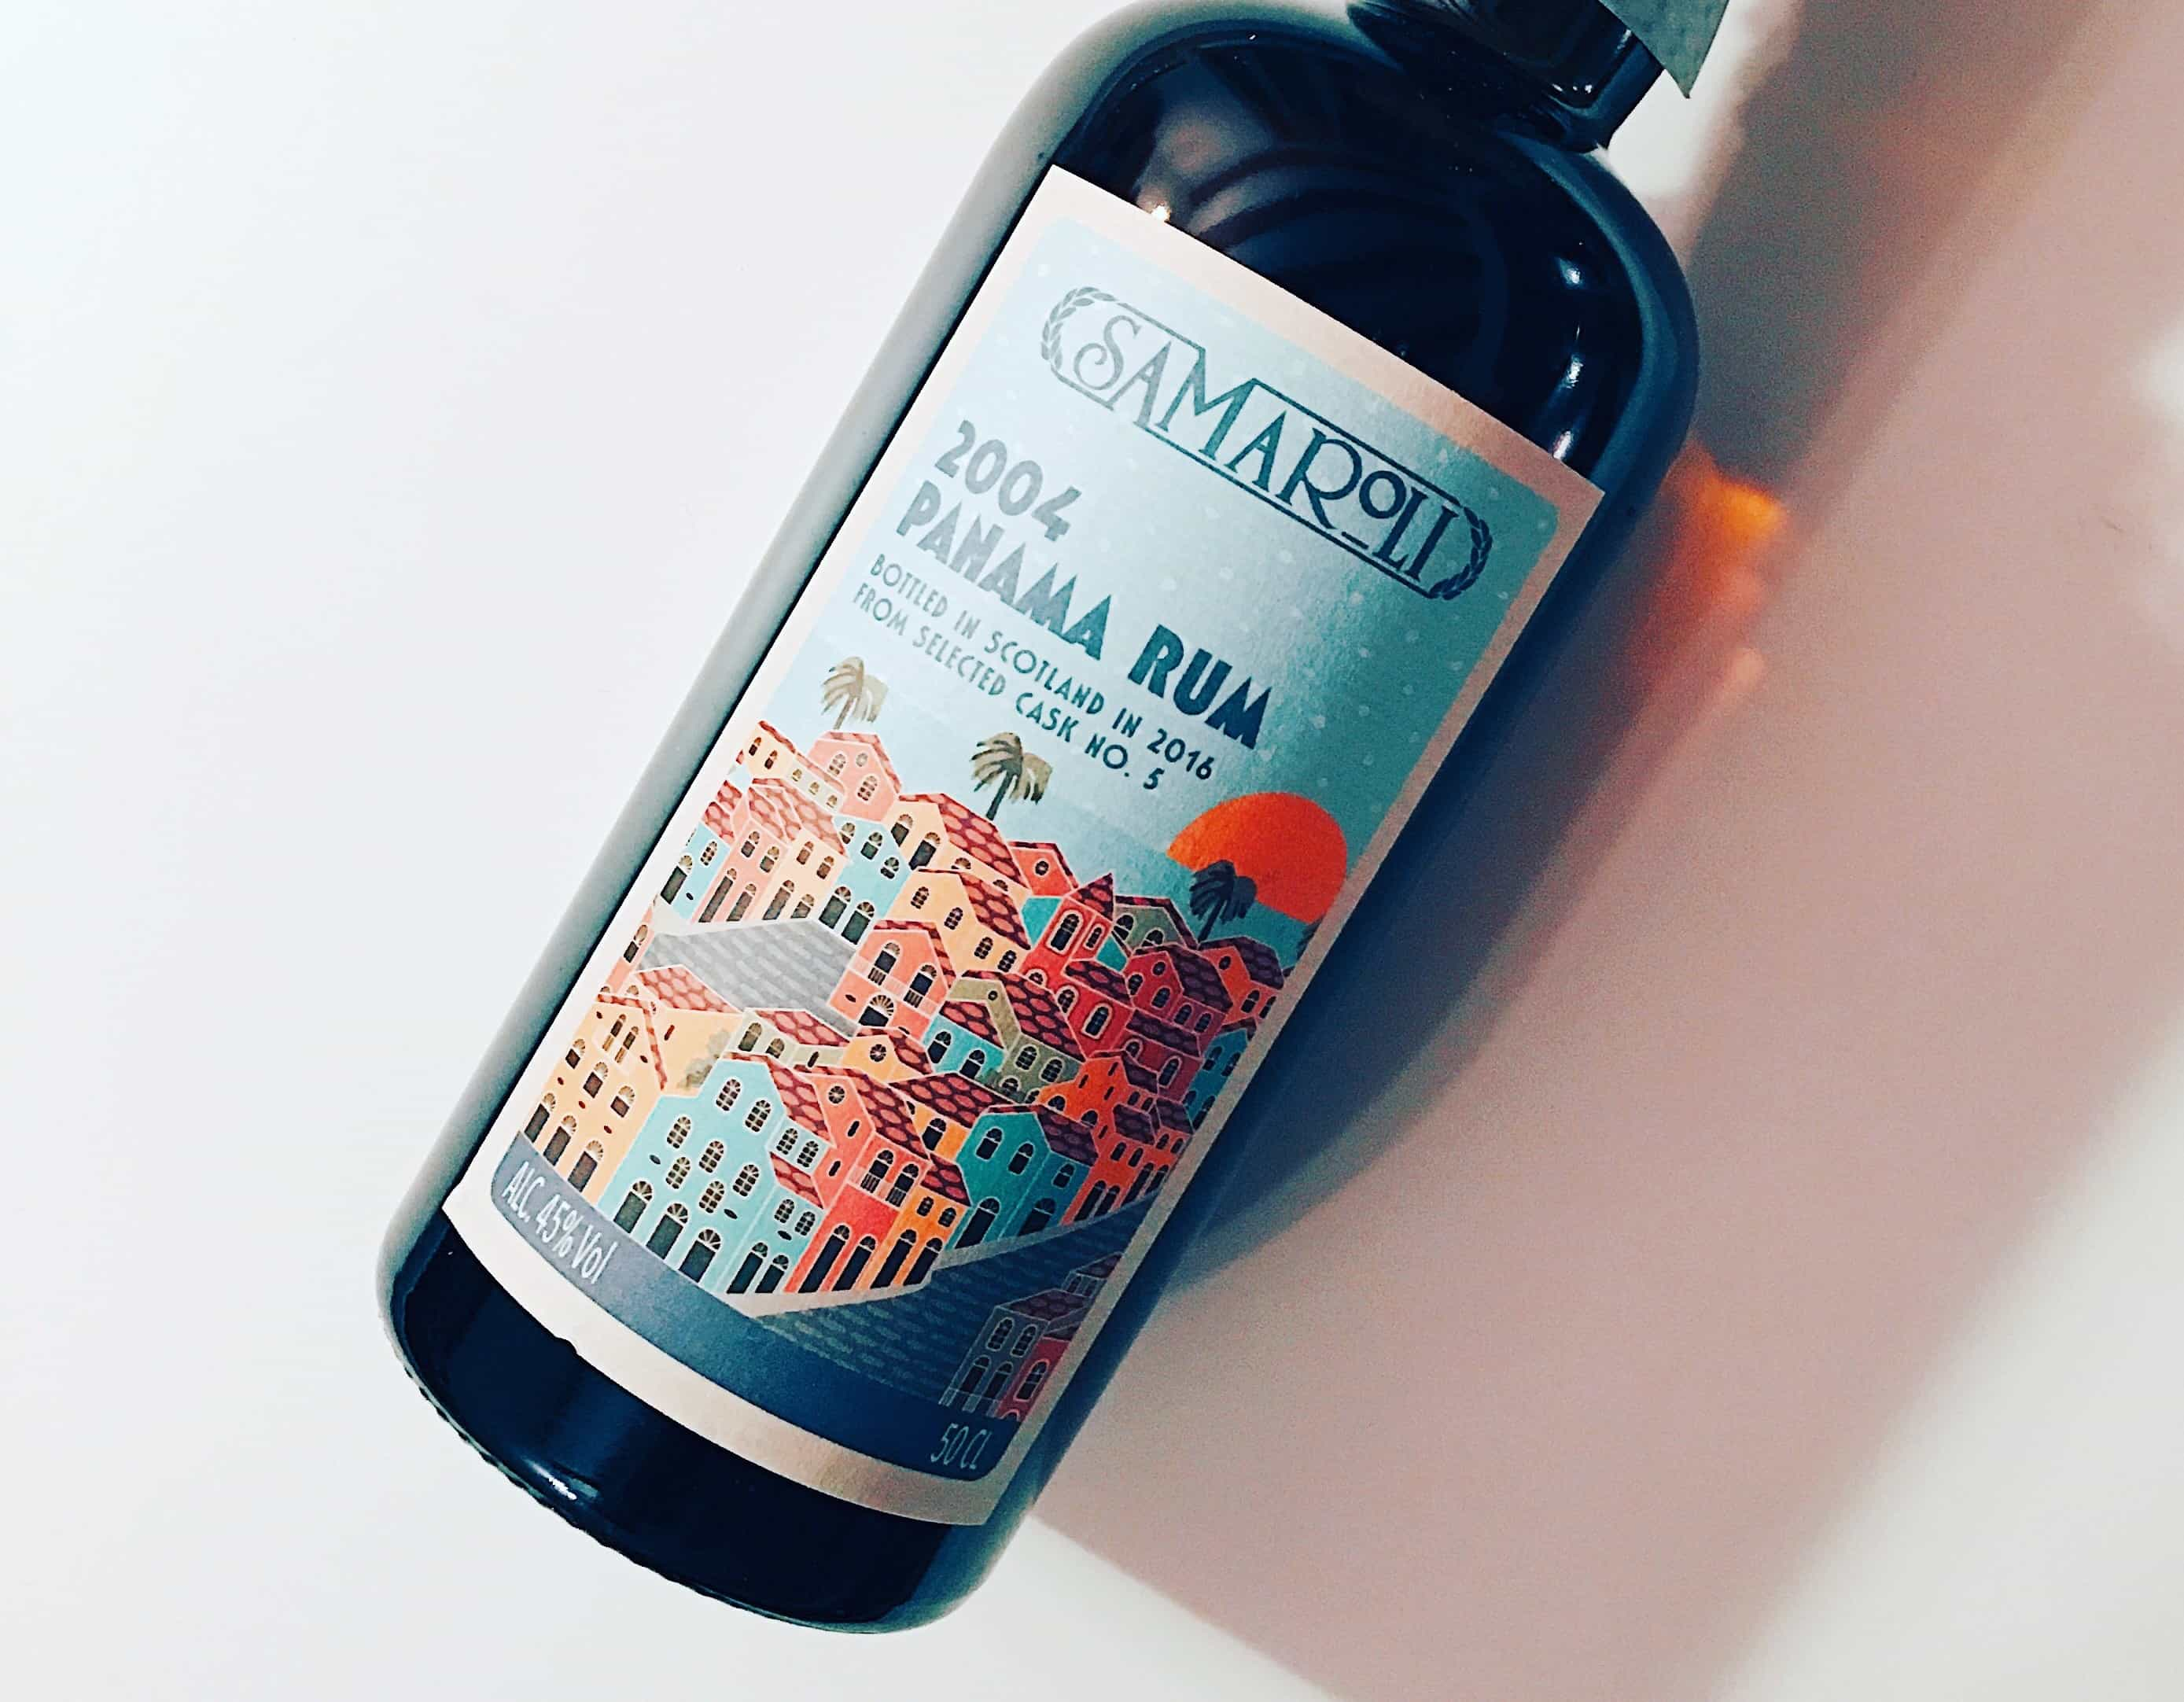 Samaroli Panama Rum 2004